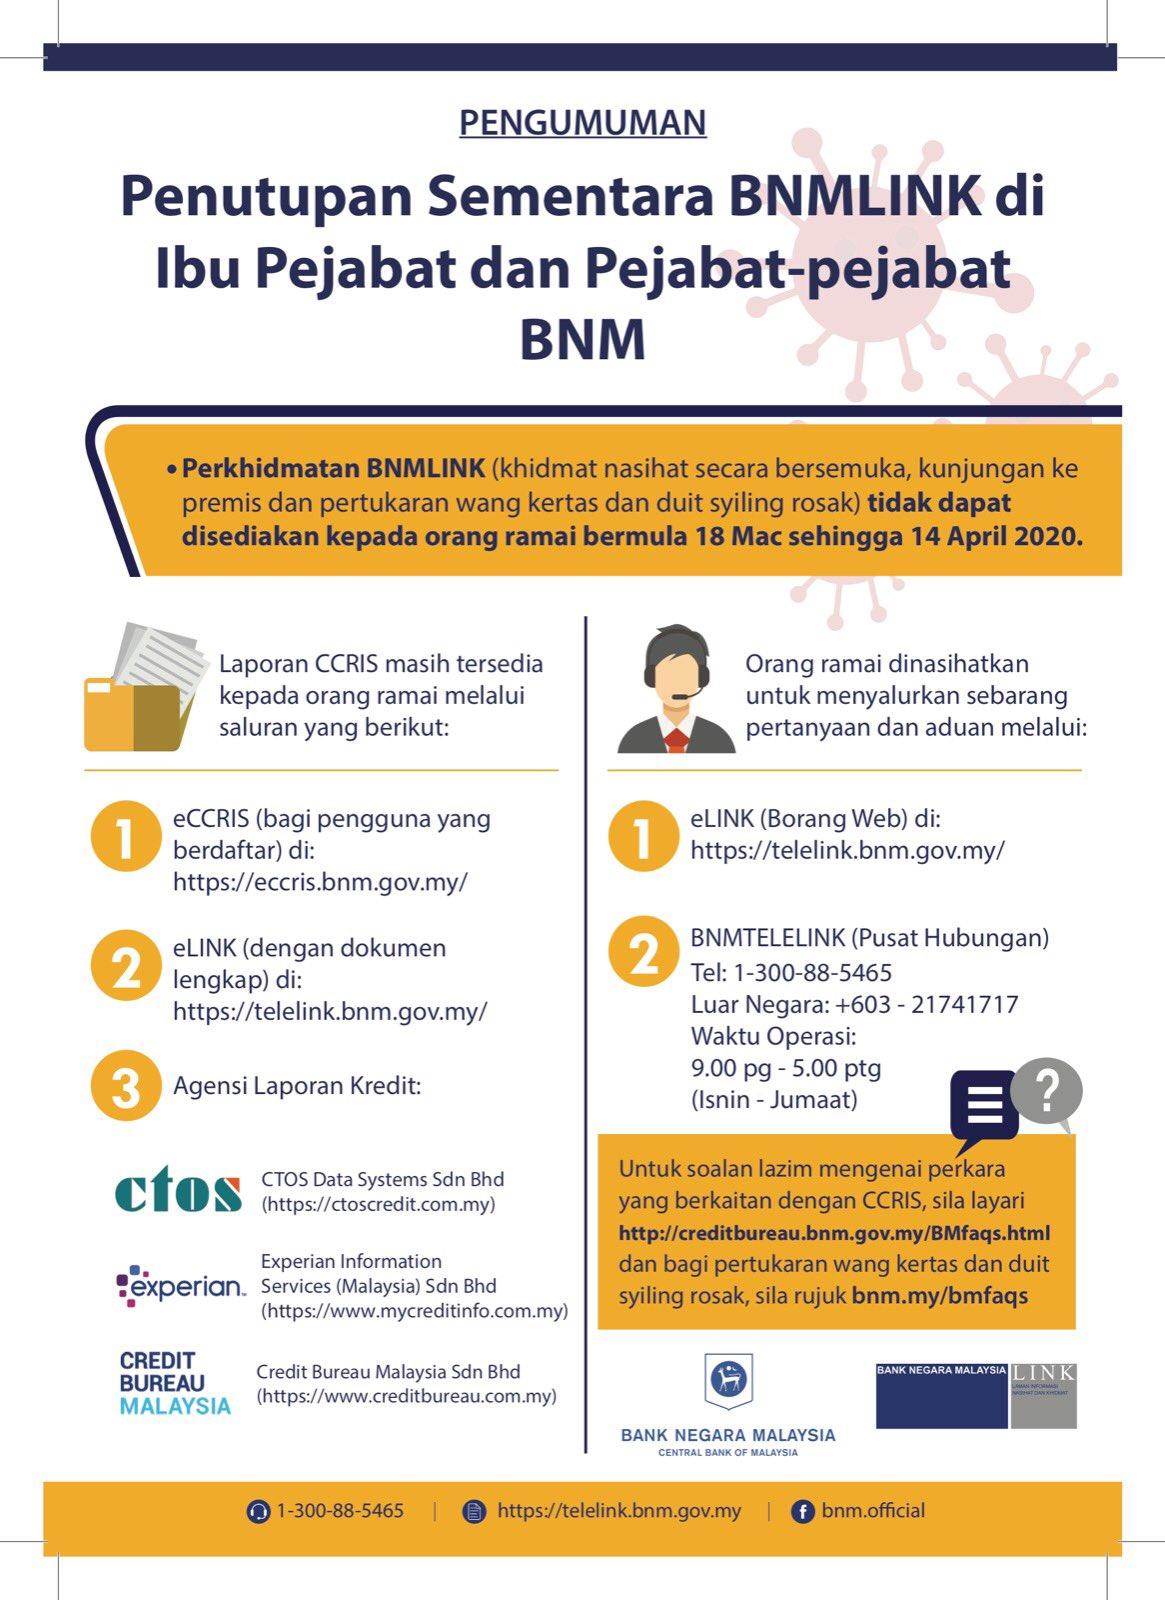 Bank Negara Malaysia בטוויטר Disebabkan Lanjutan Pkp Penutupan